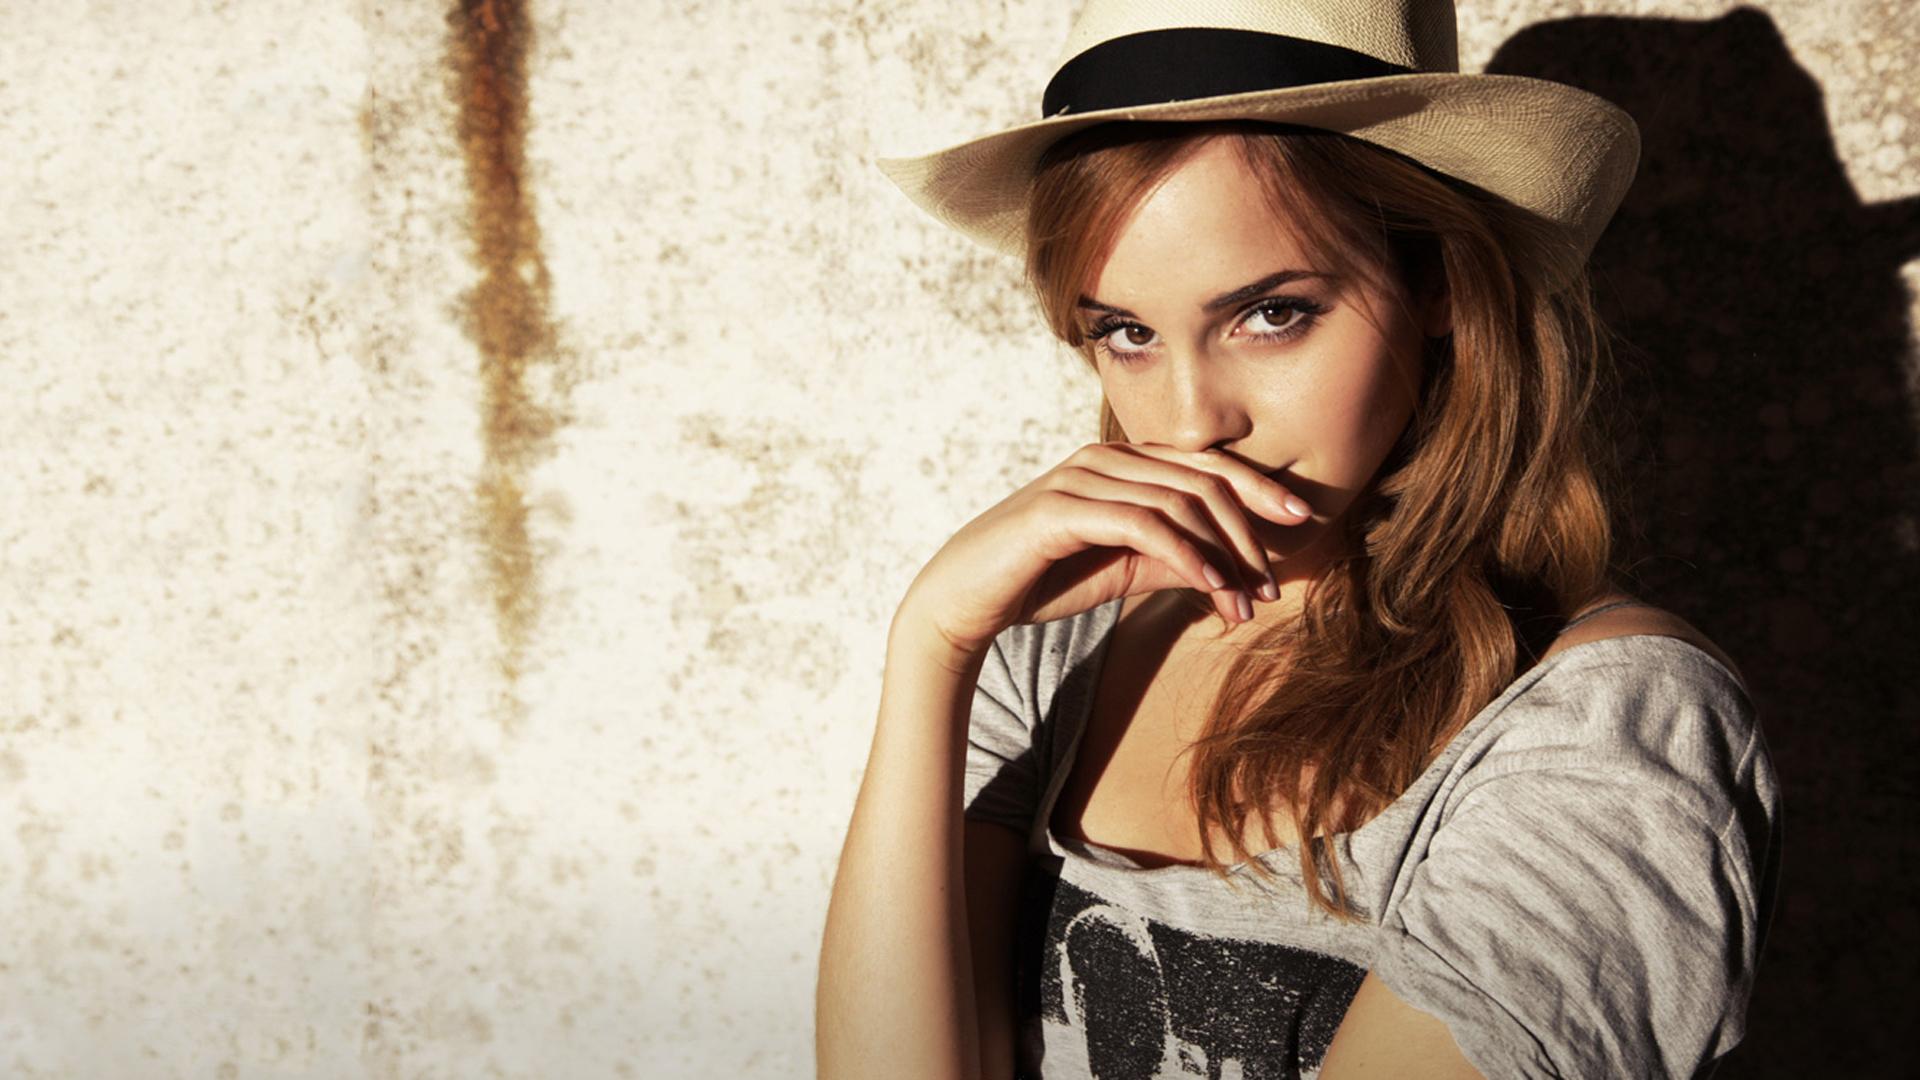 Emma Watson Wallpaper HD 1080p Full HD Celebrity and Movie 1920x1080